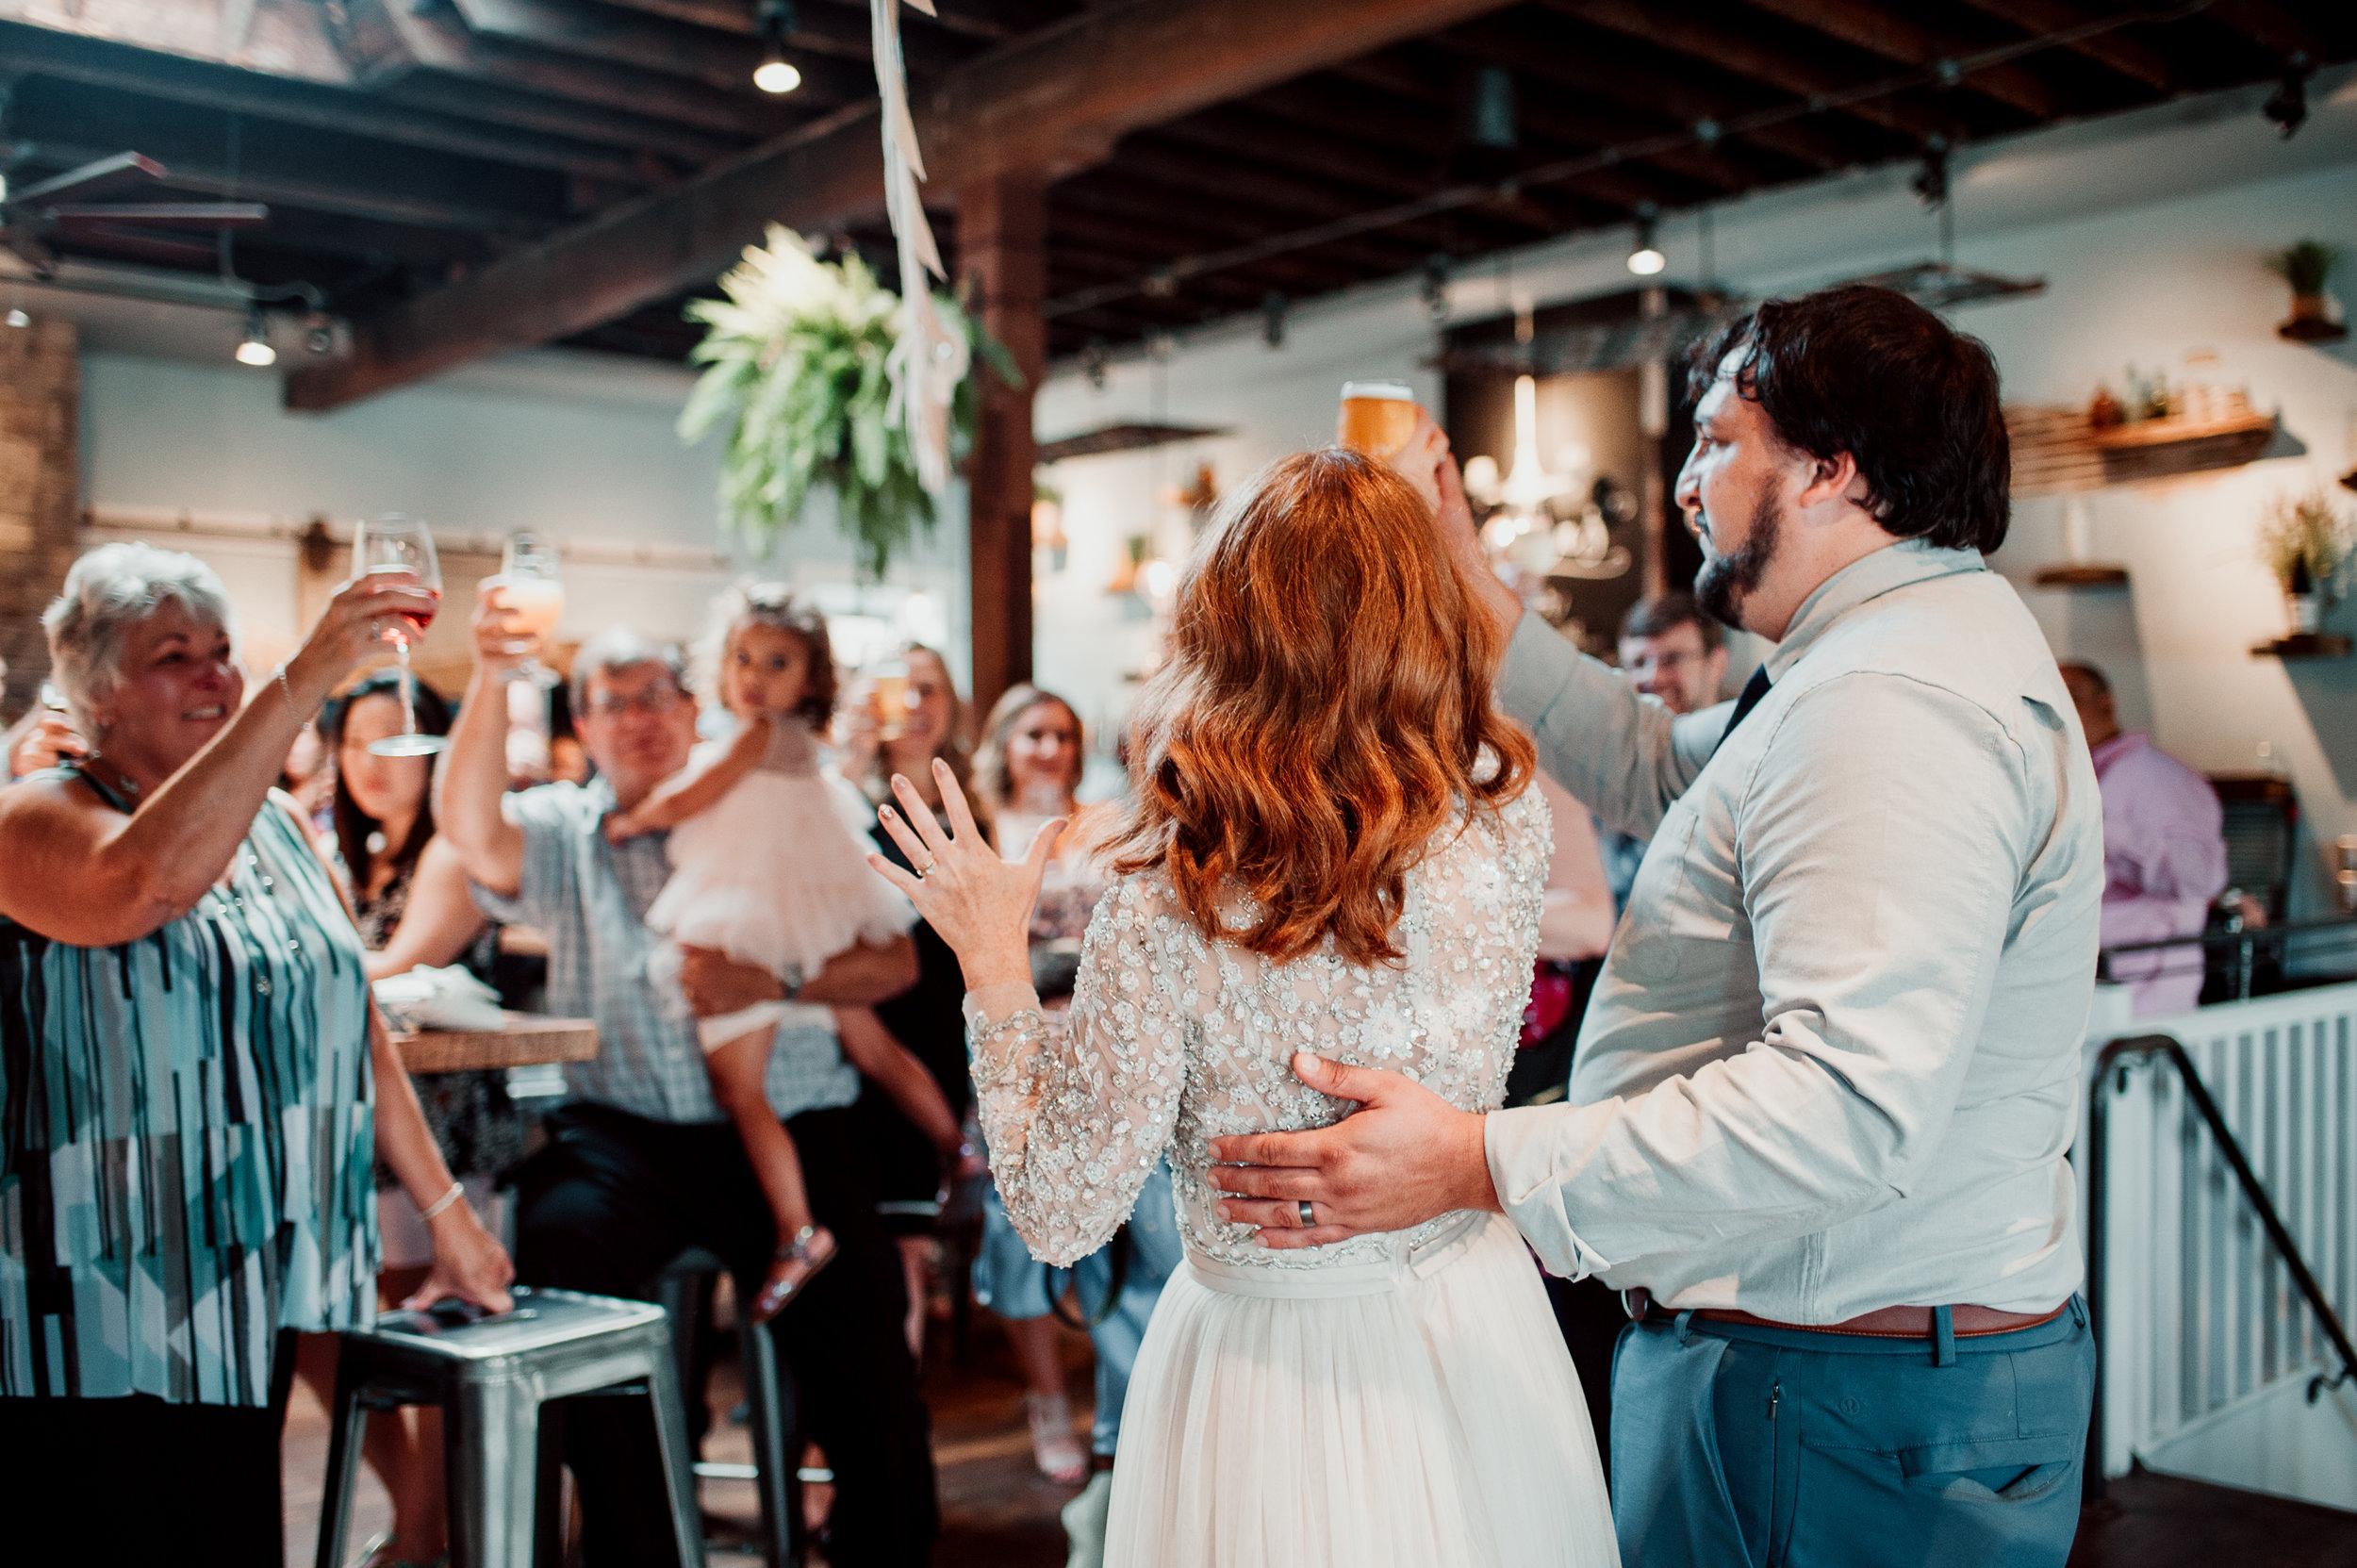 Philadelphia-wedding-photographer-la-cabra-brewery-diy-Peaberry-Photography-044.jpg